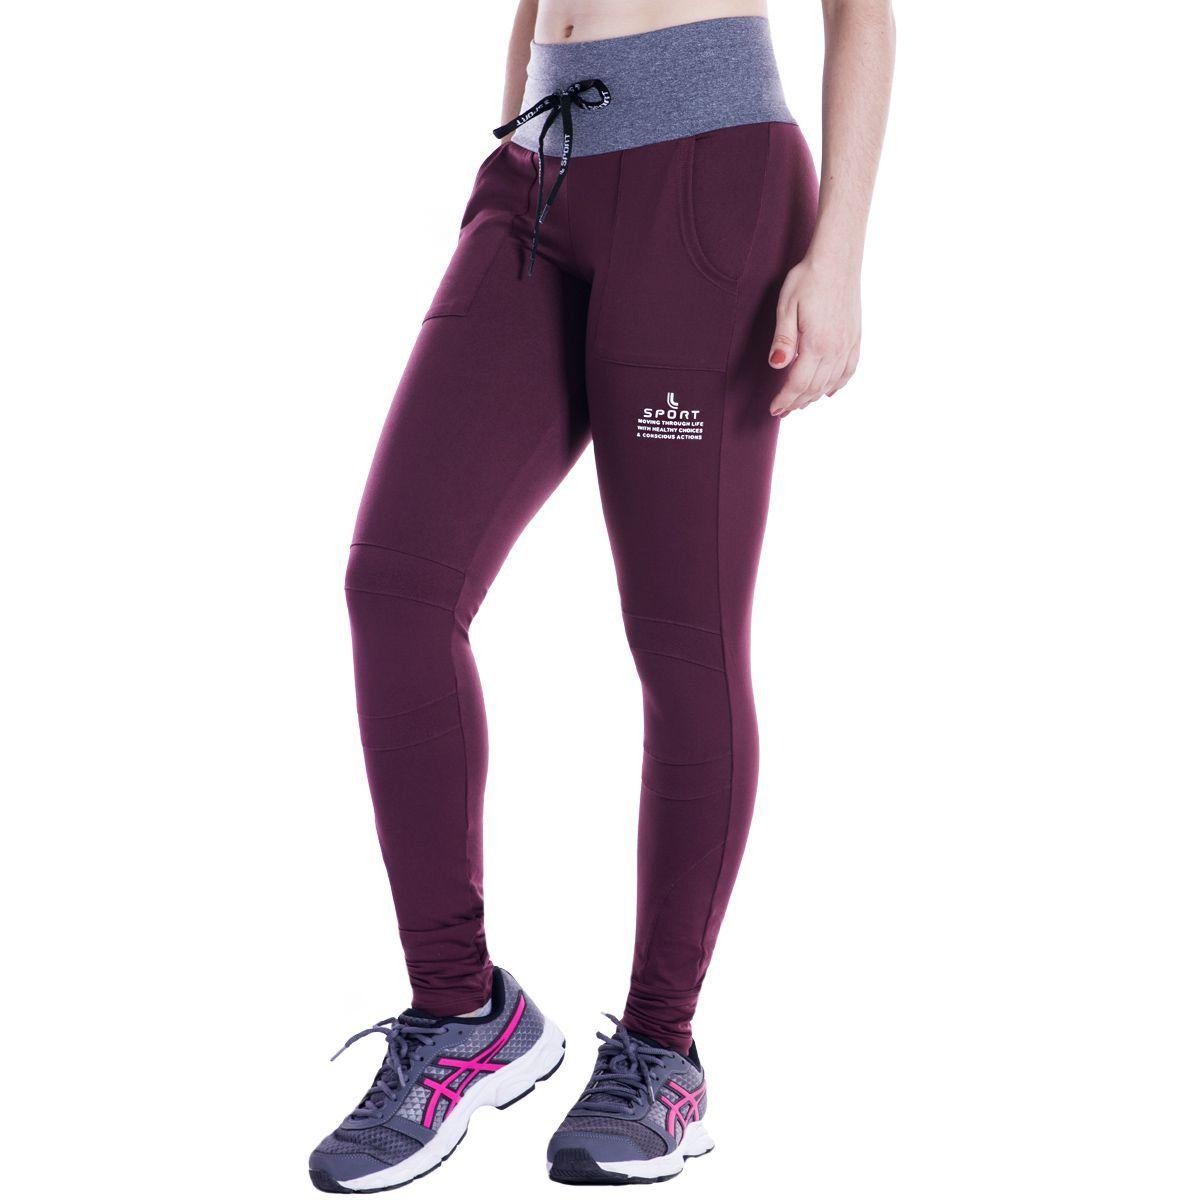 Calça Feminina Lupo Sport AF Basic Recortes